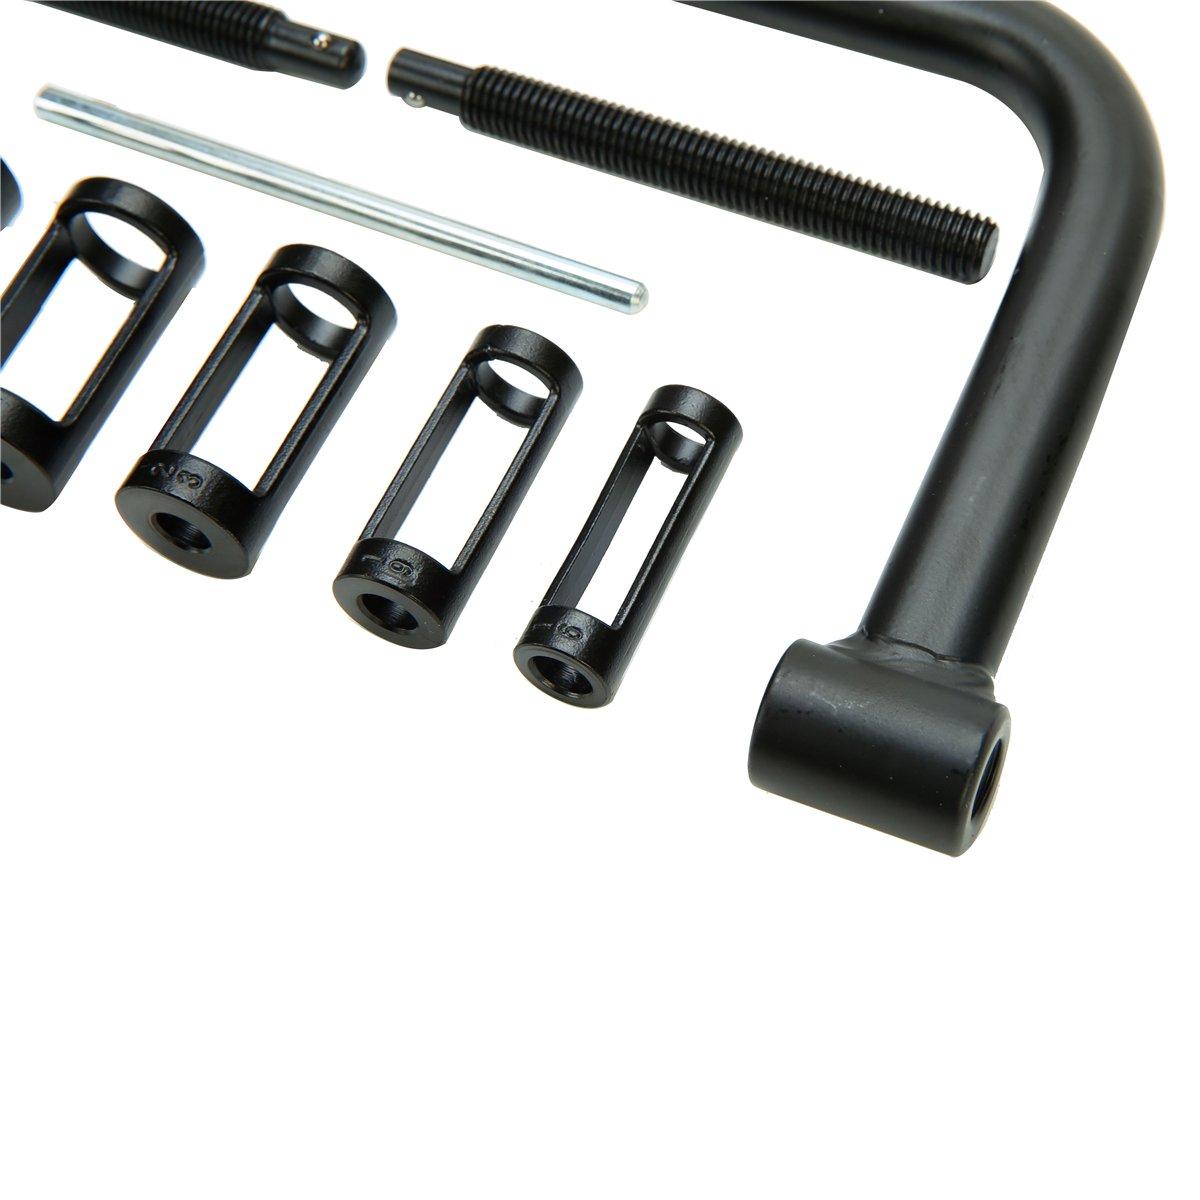 8milelake AUTO Solid Valve Spring Compressor Automotive Tool Set Repair Tool Kit by 8MILELAE (Image #4)